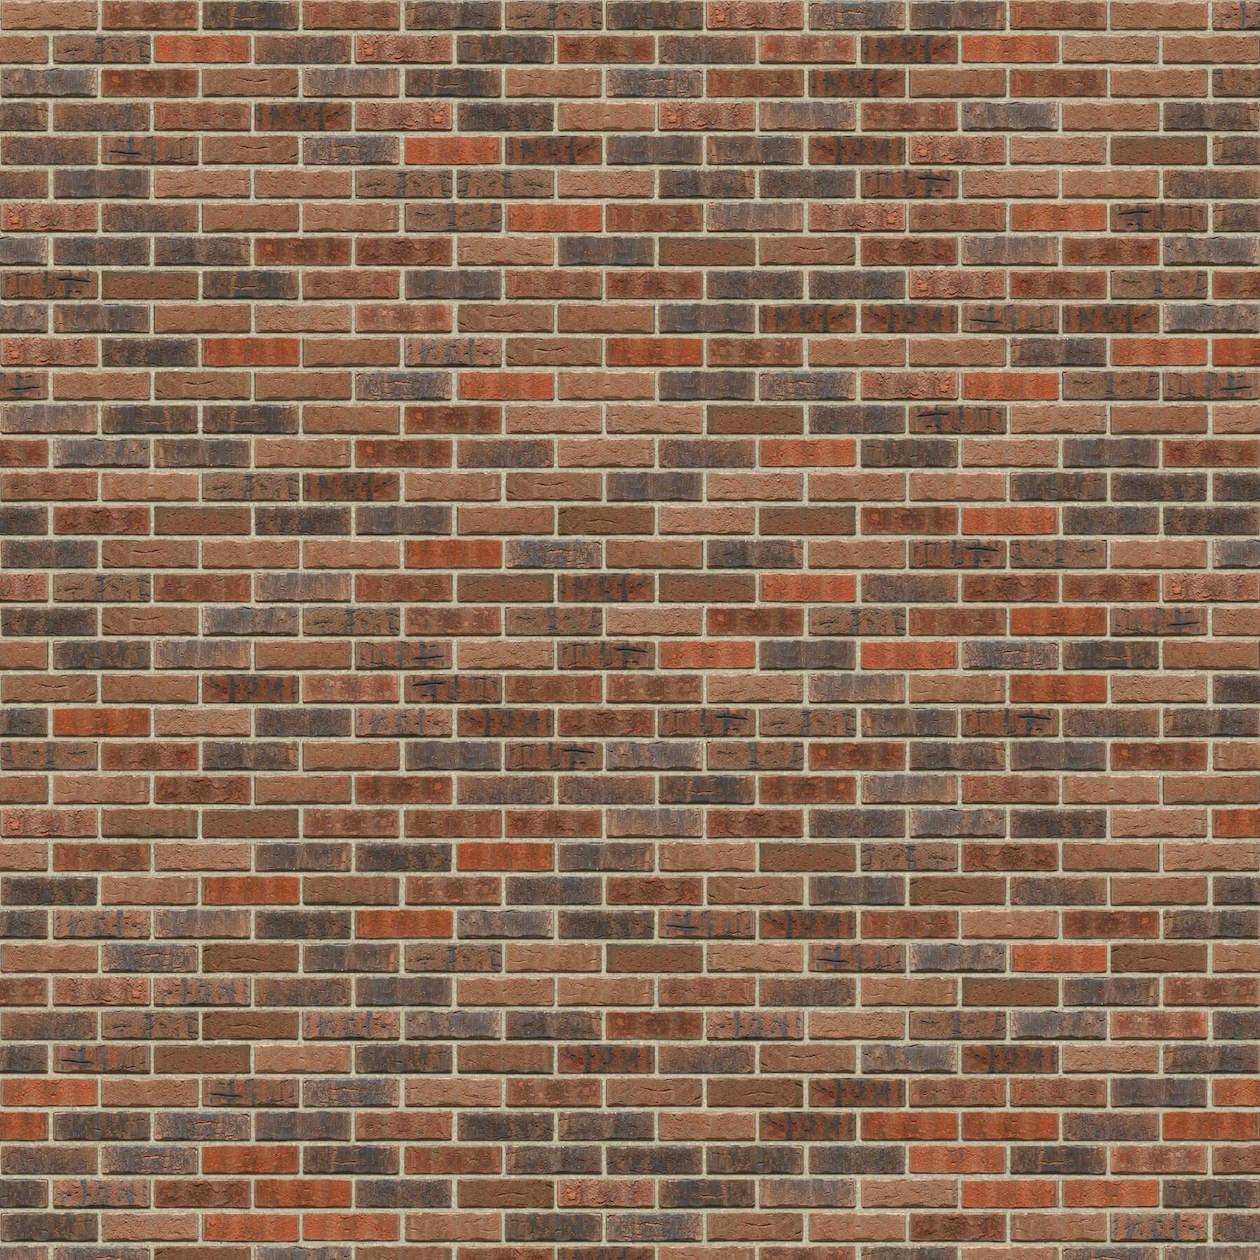 Puna-cigla-FeldHaus-Klinker-brick-house-nf-k-685-Bez Fuga